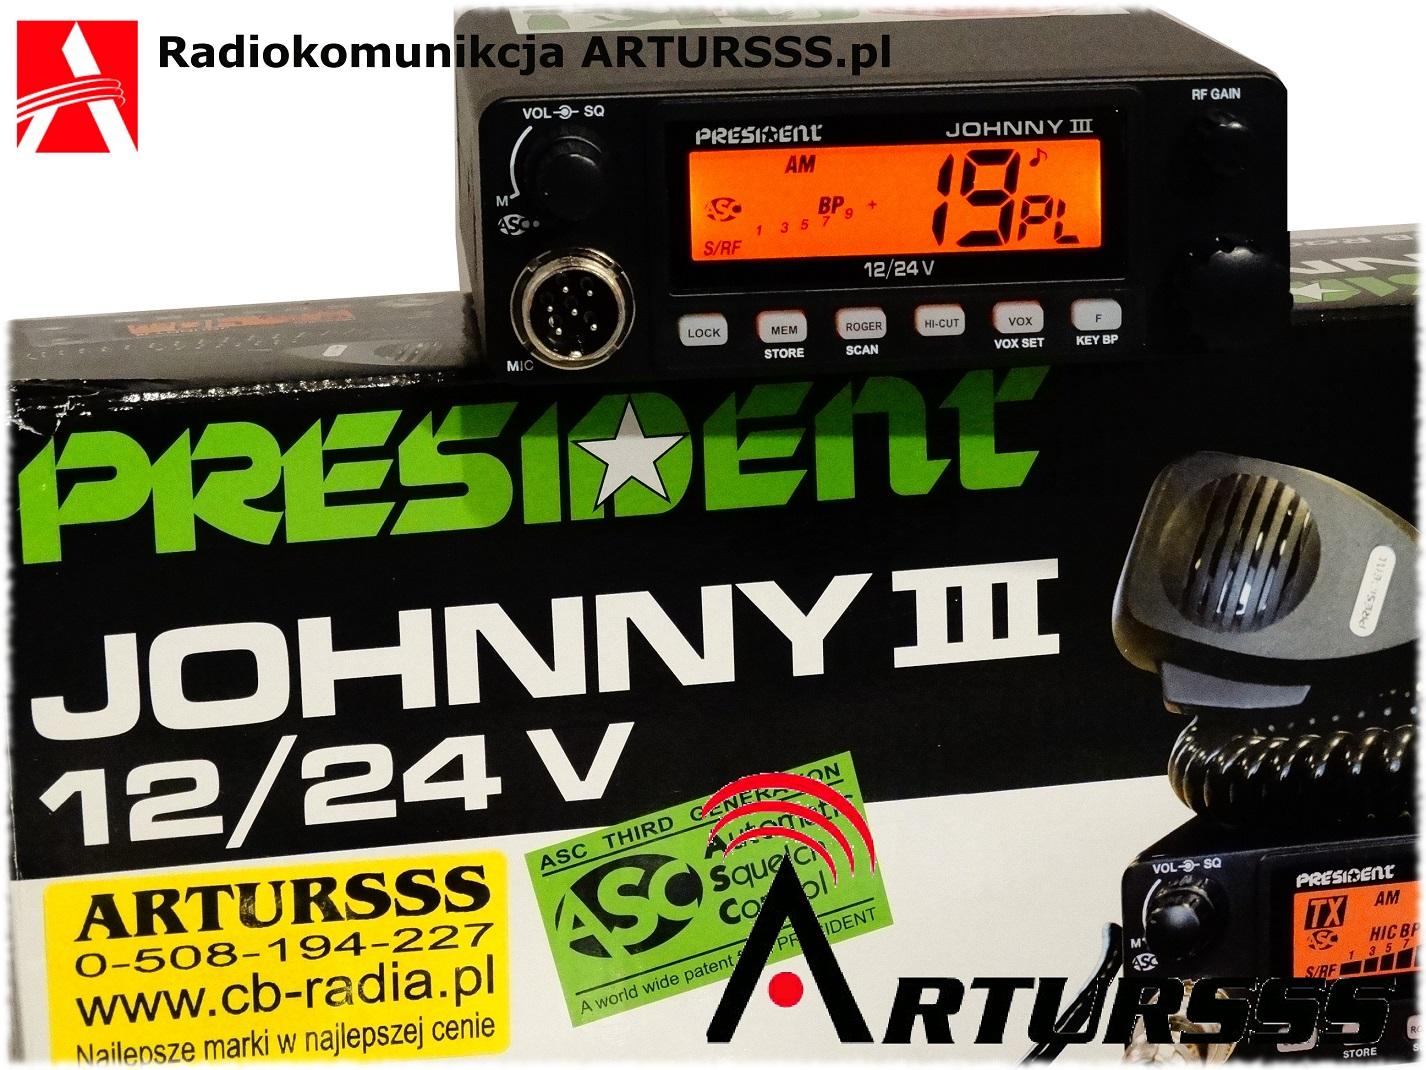 CBradio President Johnny III ASC 12/24